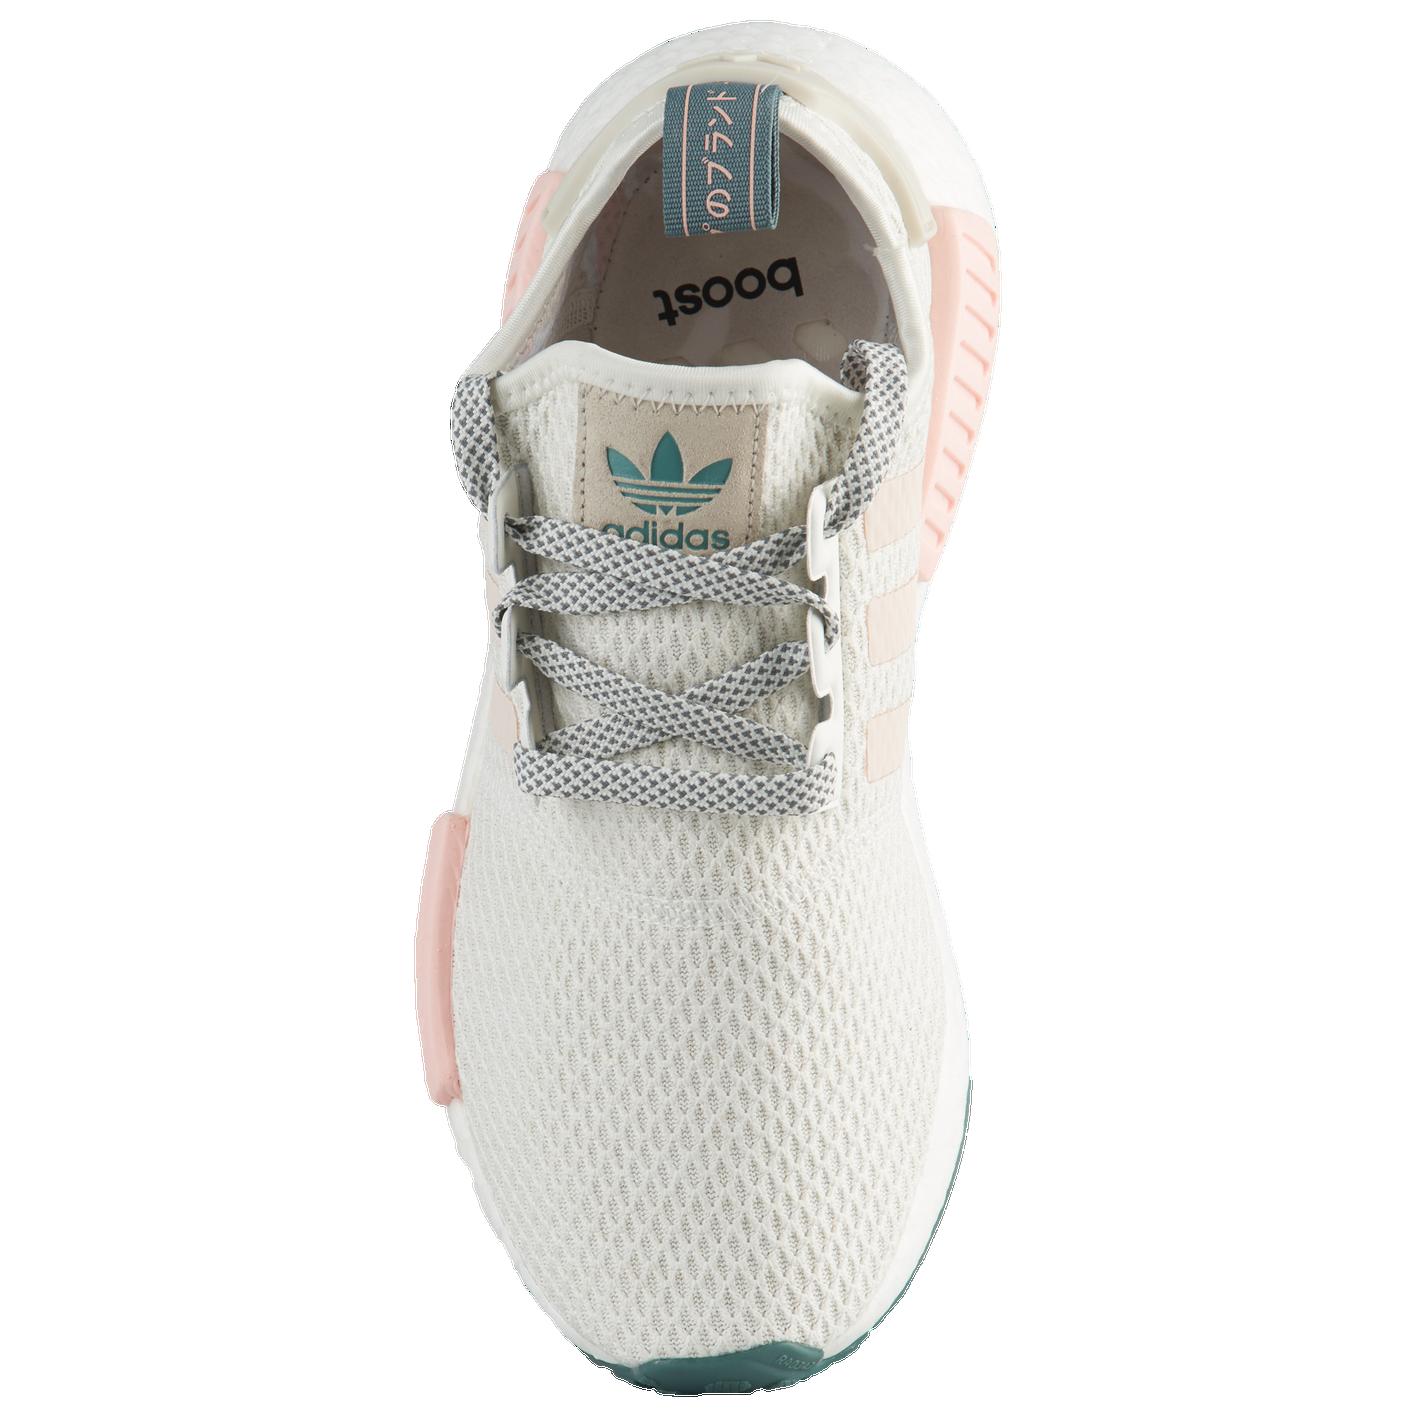 86705331cefab adidas Originals NMD R1 - Women s - Casual - Shoes - Cloud White ...